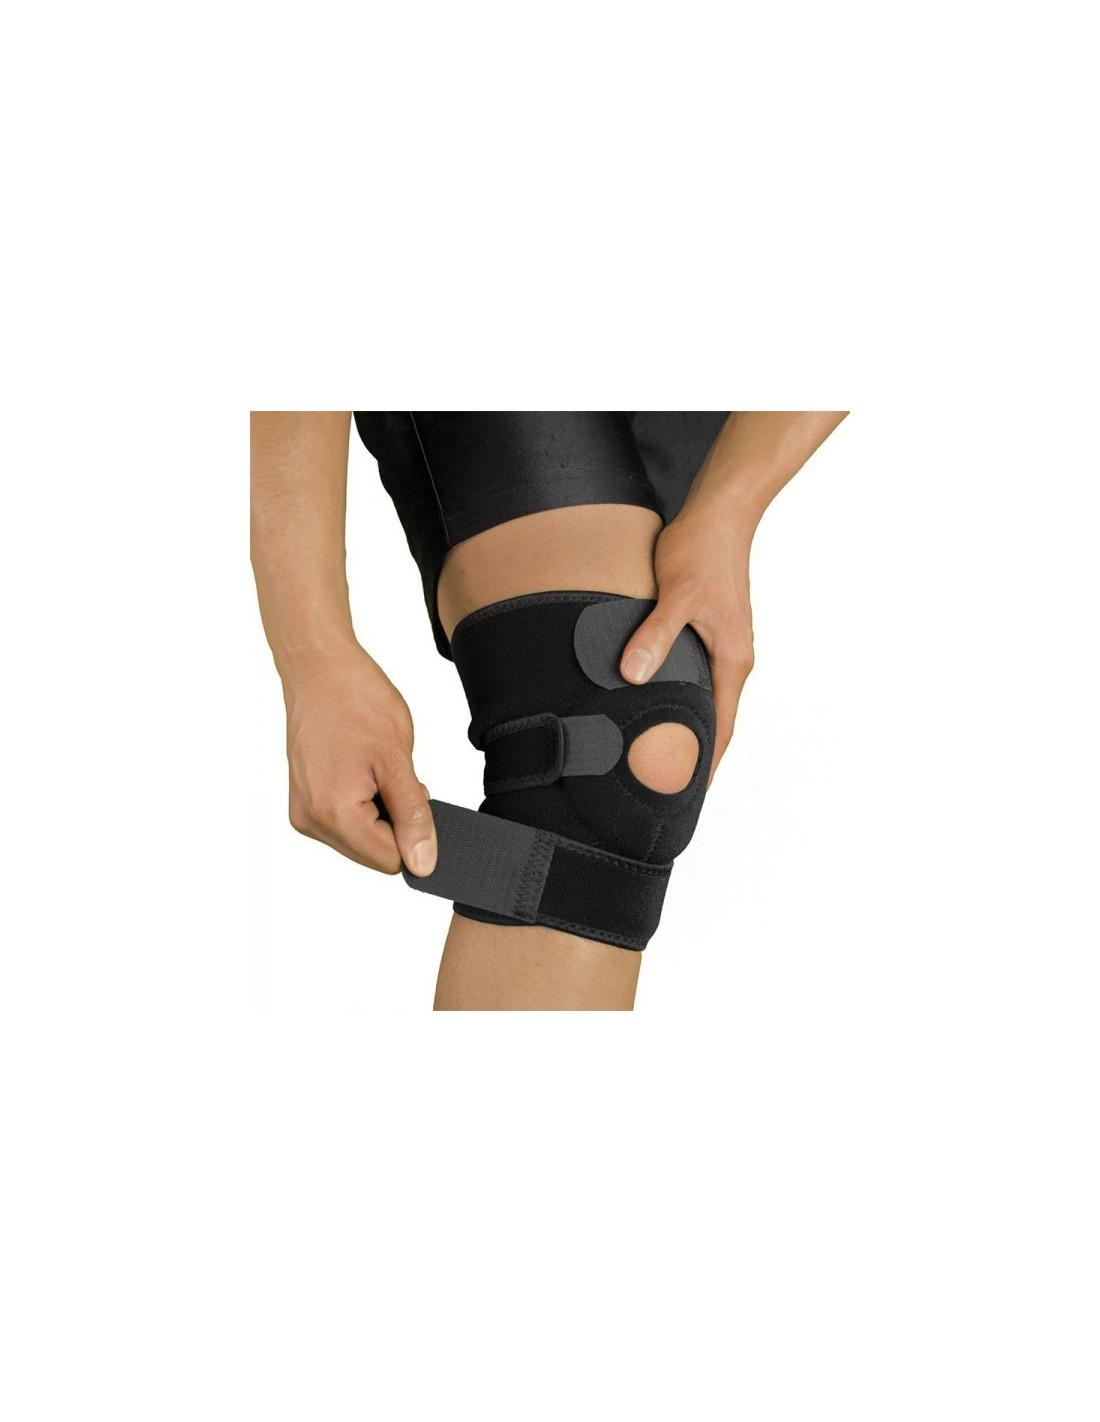 dureri de genunchi postoperator